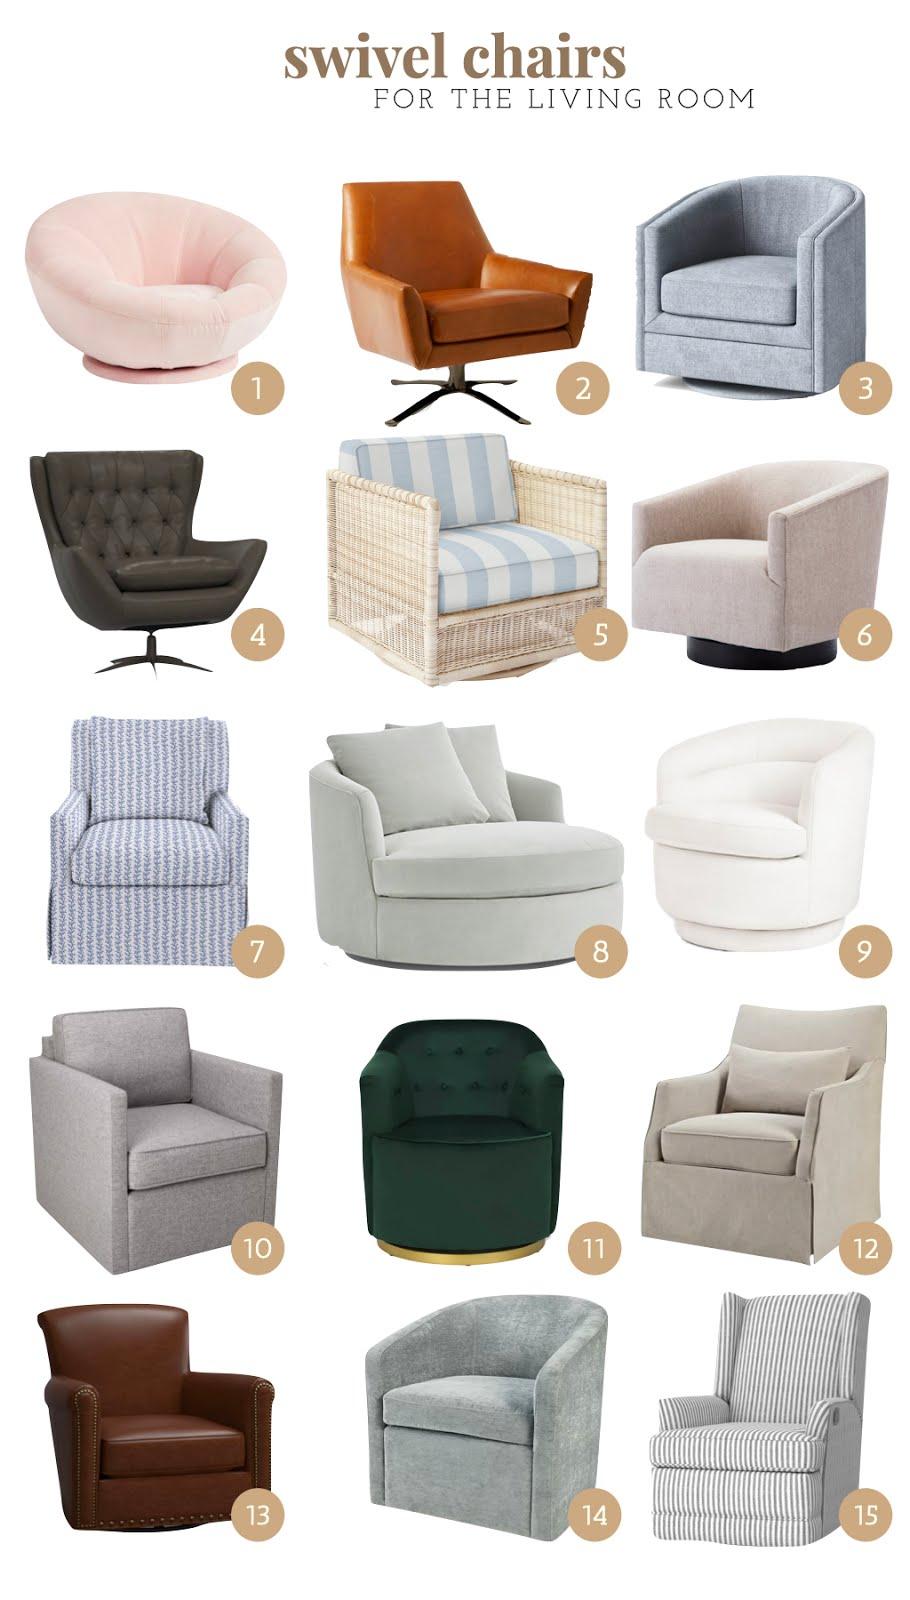 swivel chairs living room, small swivel chairs, swivel chair rocker, swivel chair recliner, upholstered swivel chair